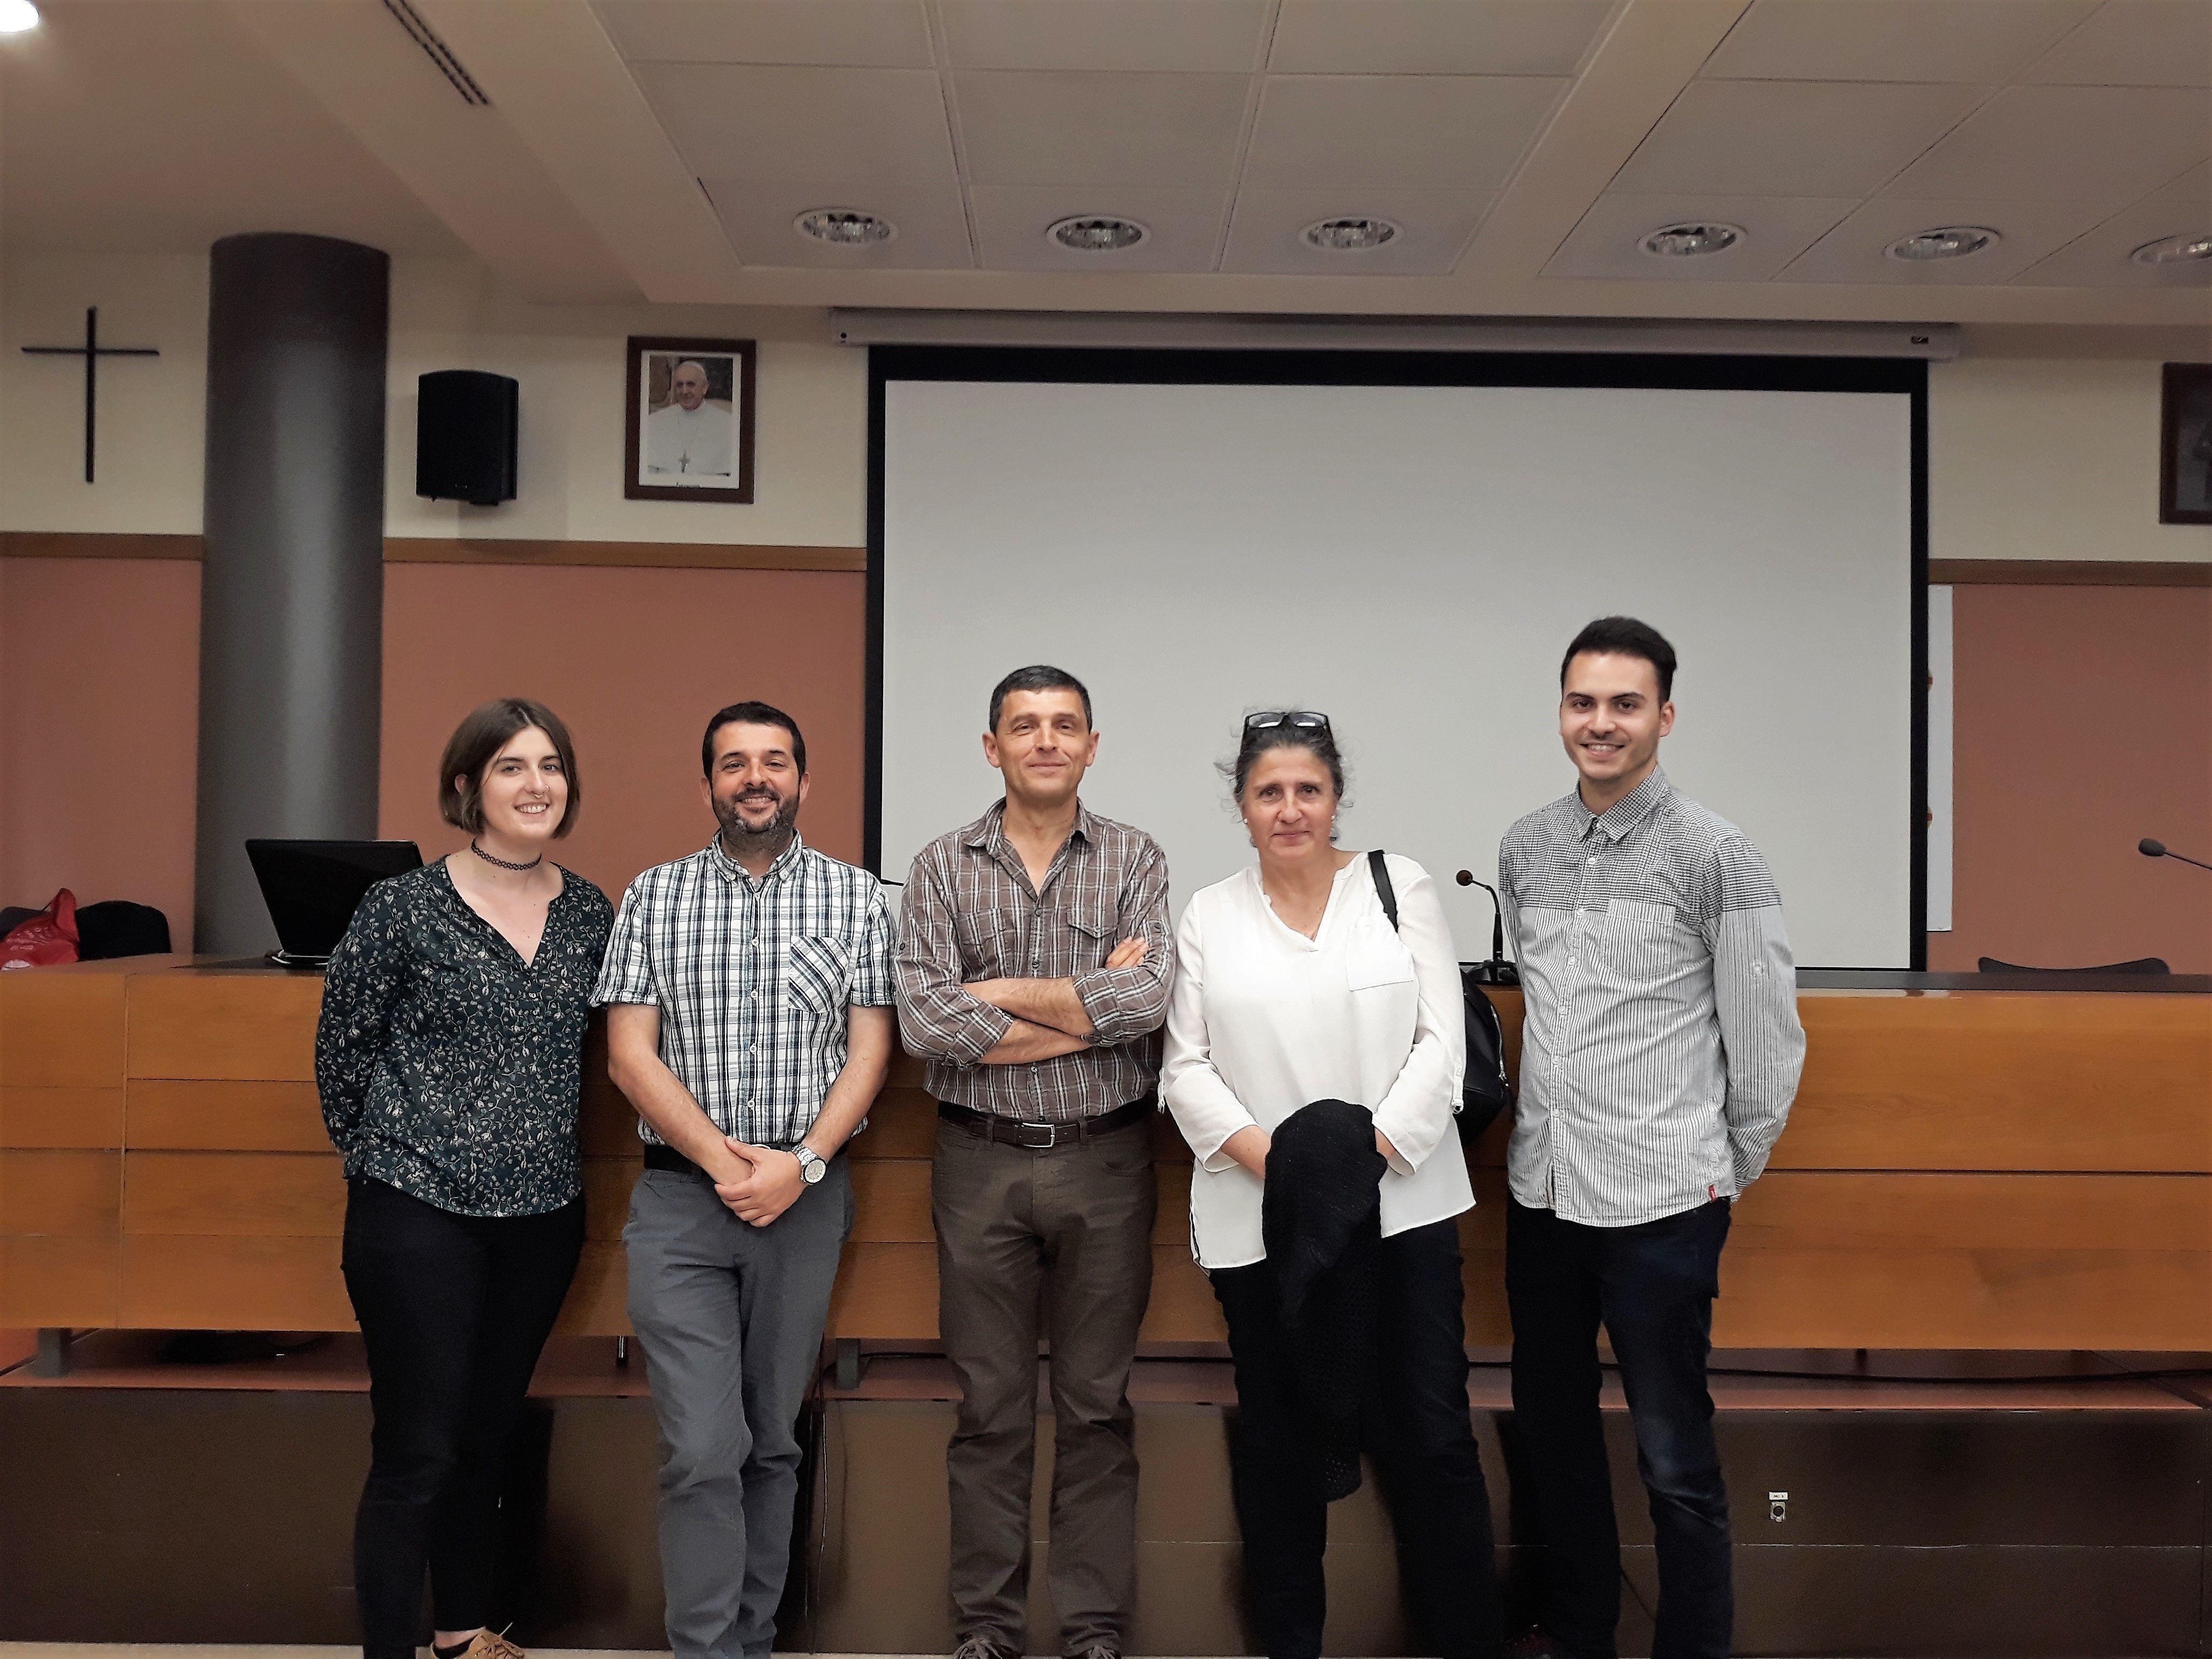 Alba Gómez, Héctor Sanz, Federico Guillén, Cati Gerique y Javier de Juan